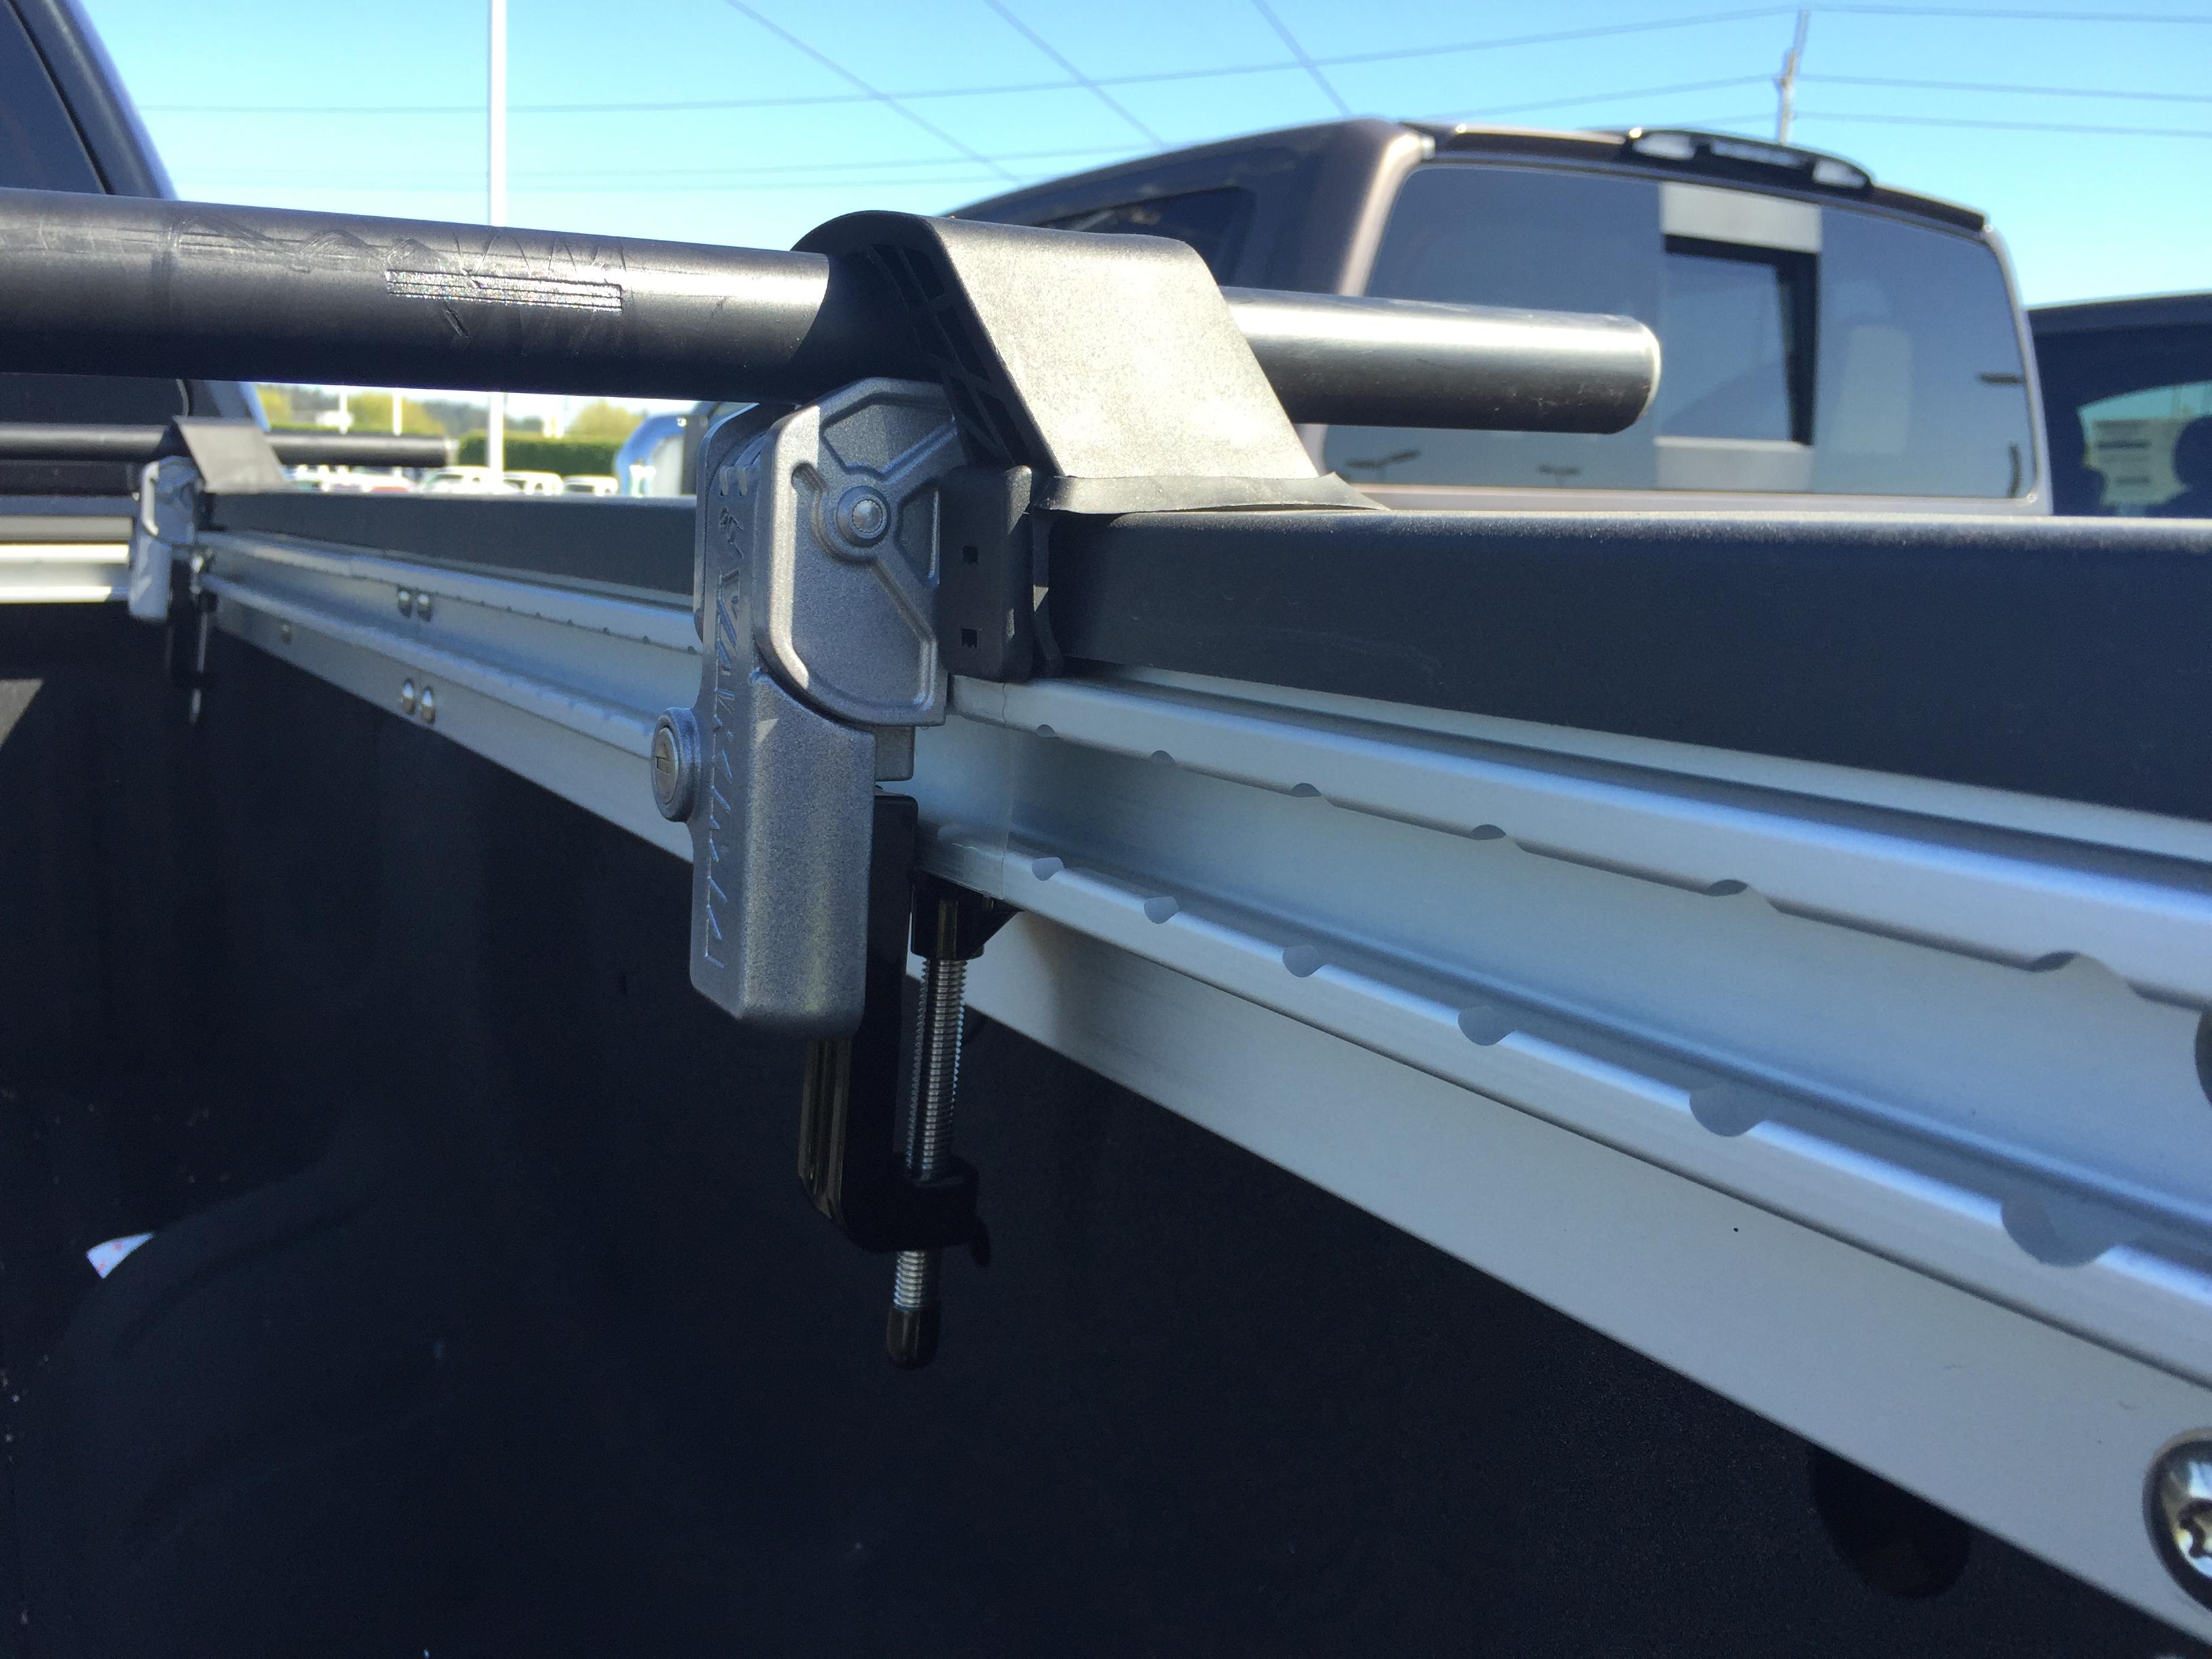 truck of x bed att photo tent rack sydney roof expedition ram racks top aluminum